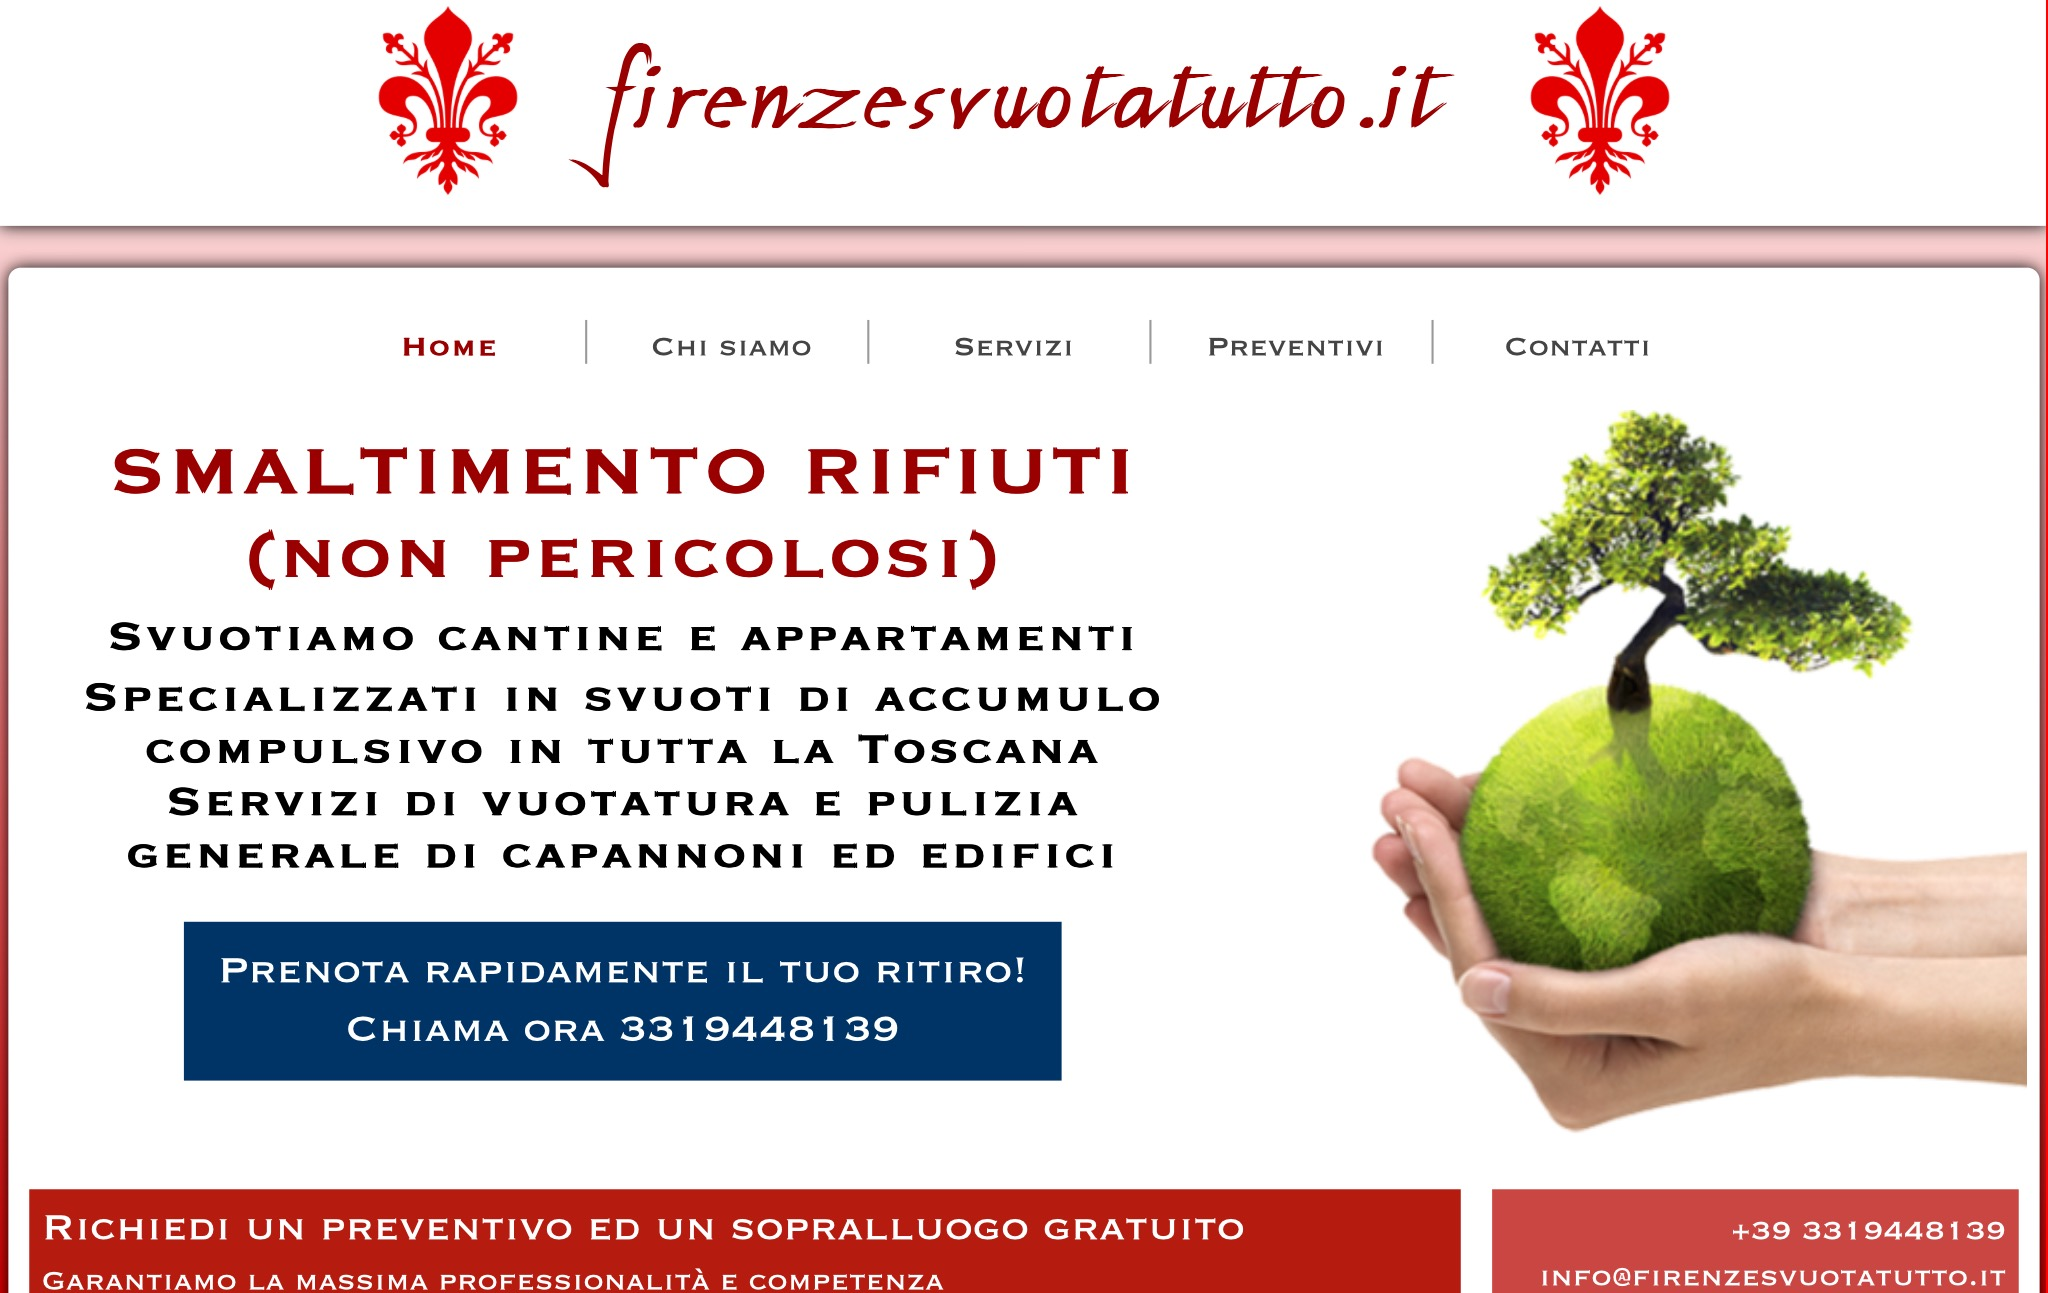 Svuota Appartamenti Gratis Firenze lavoro offerte annunci « categories « my annunci prezzi